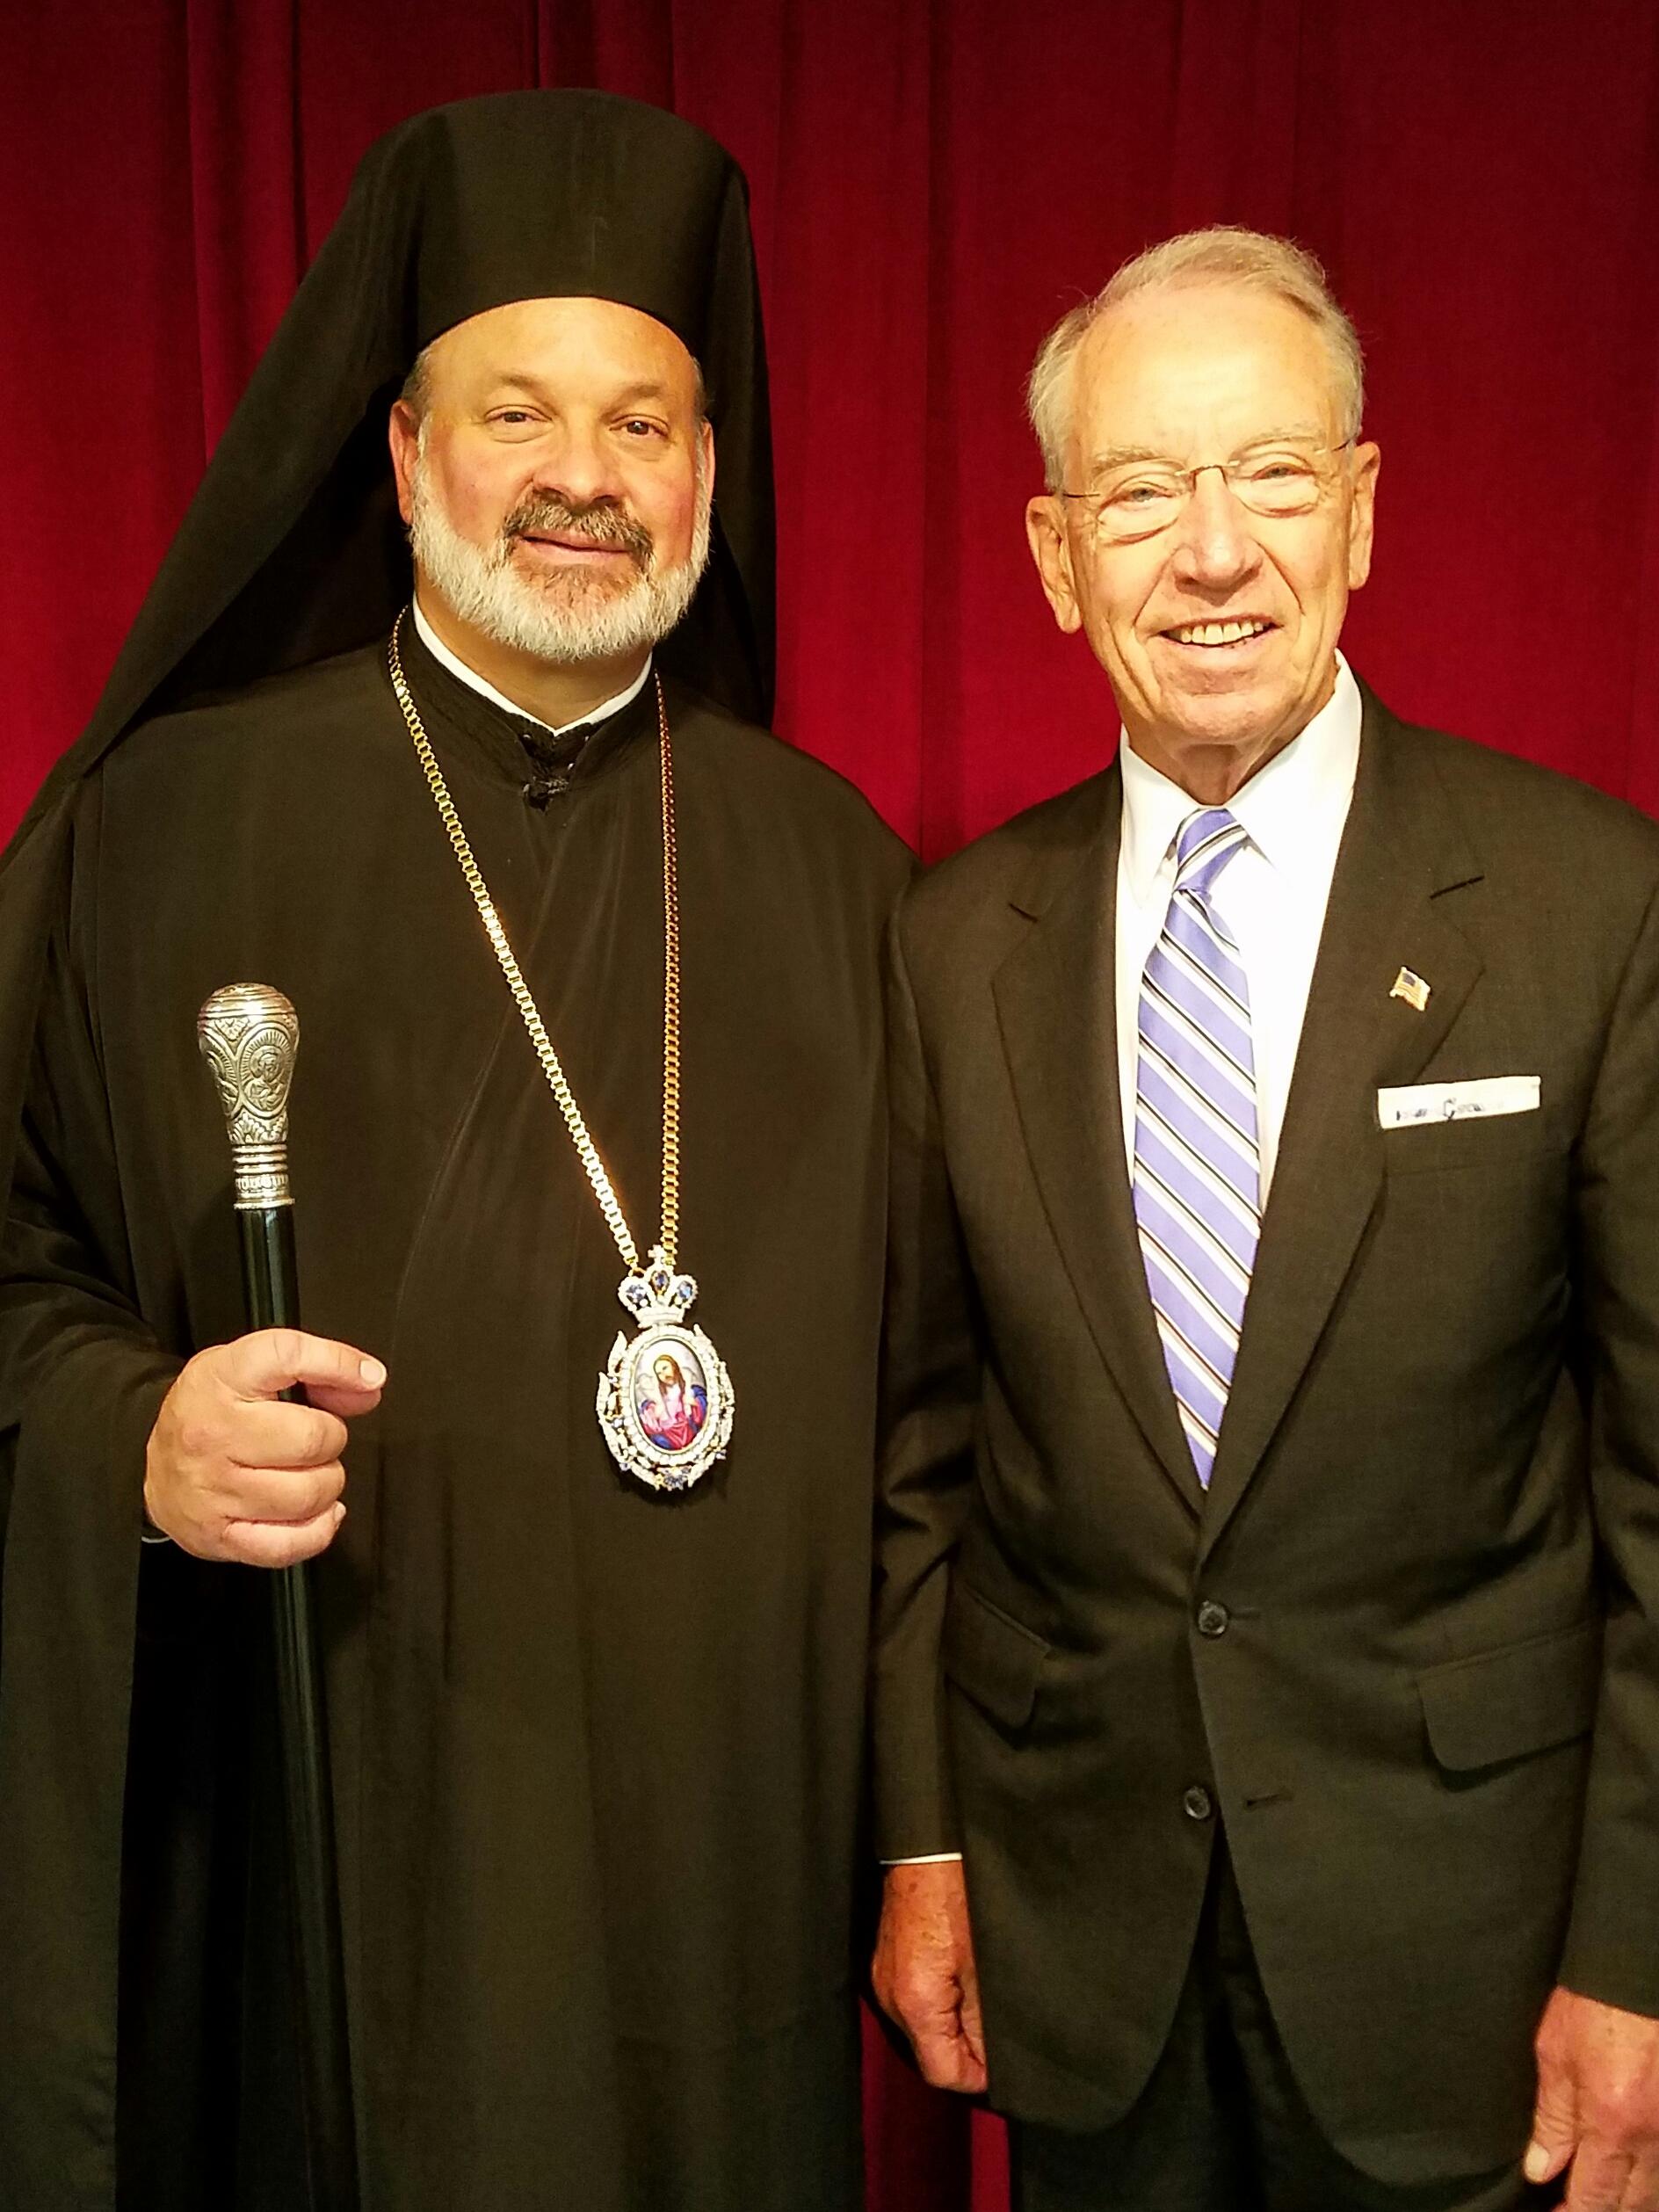 His Grace Bishop Demetrios with United States Senator Chuck Grassley